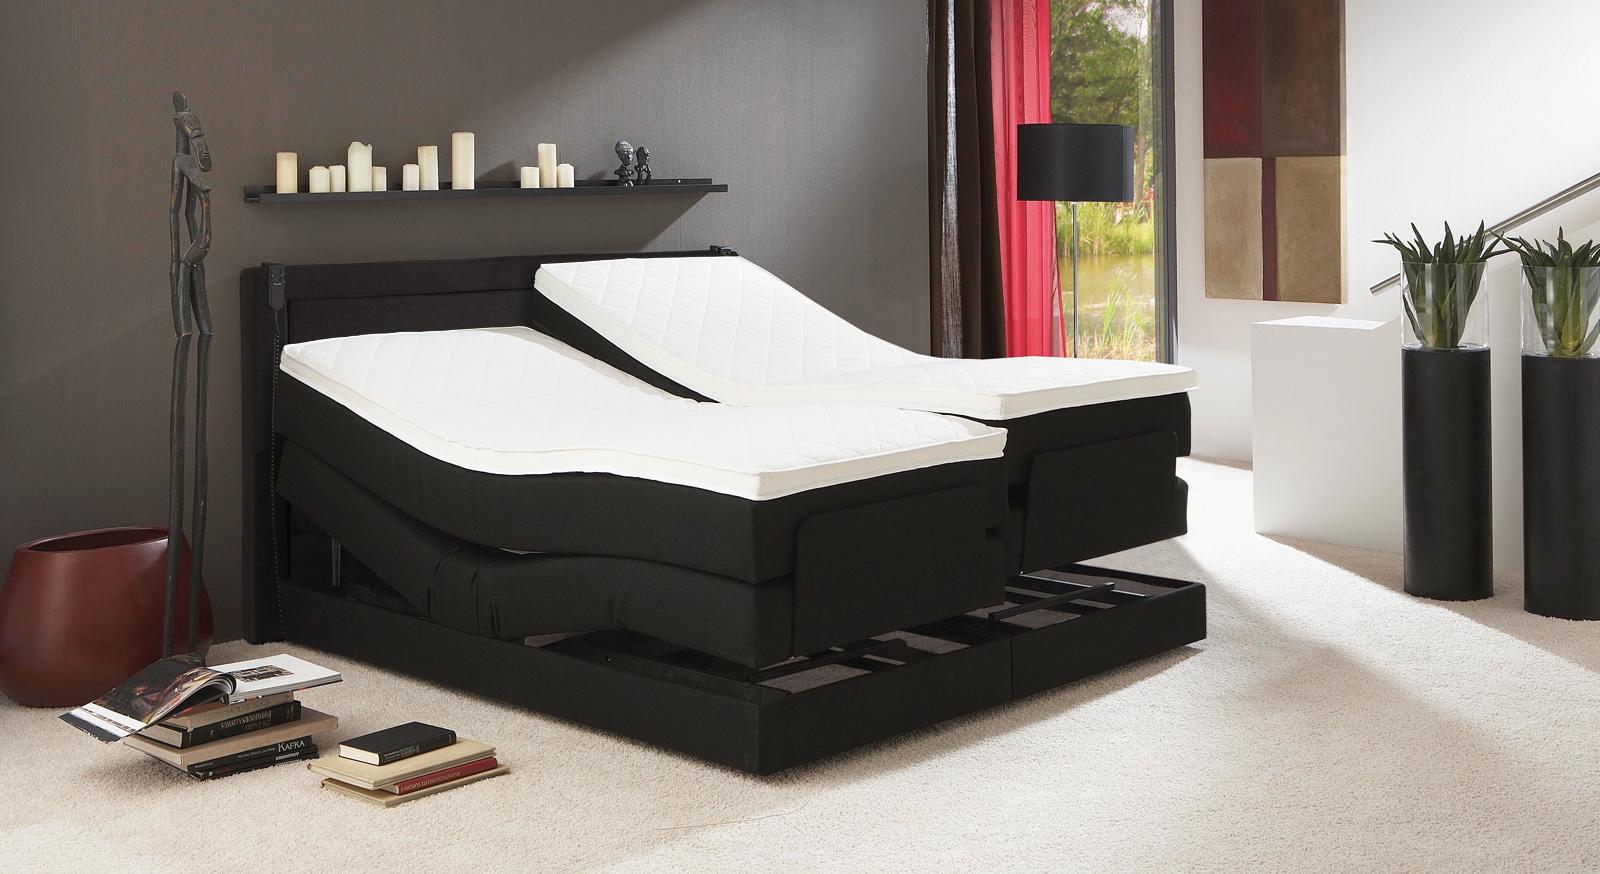 Schlafzimmer mit boxspringbett – midir